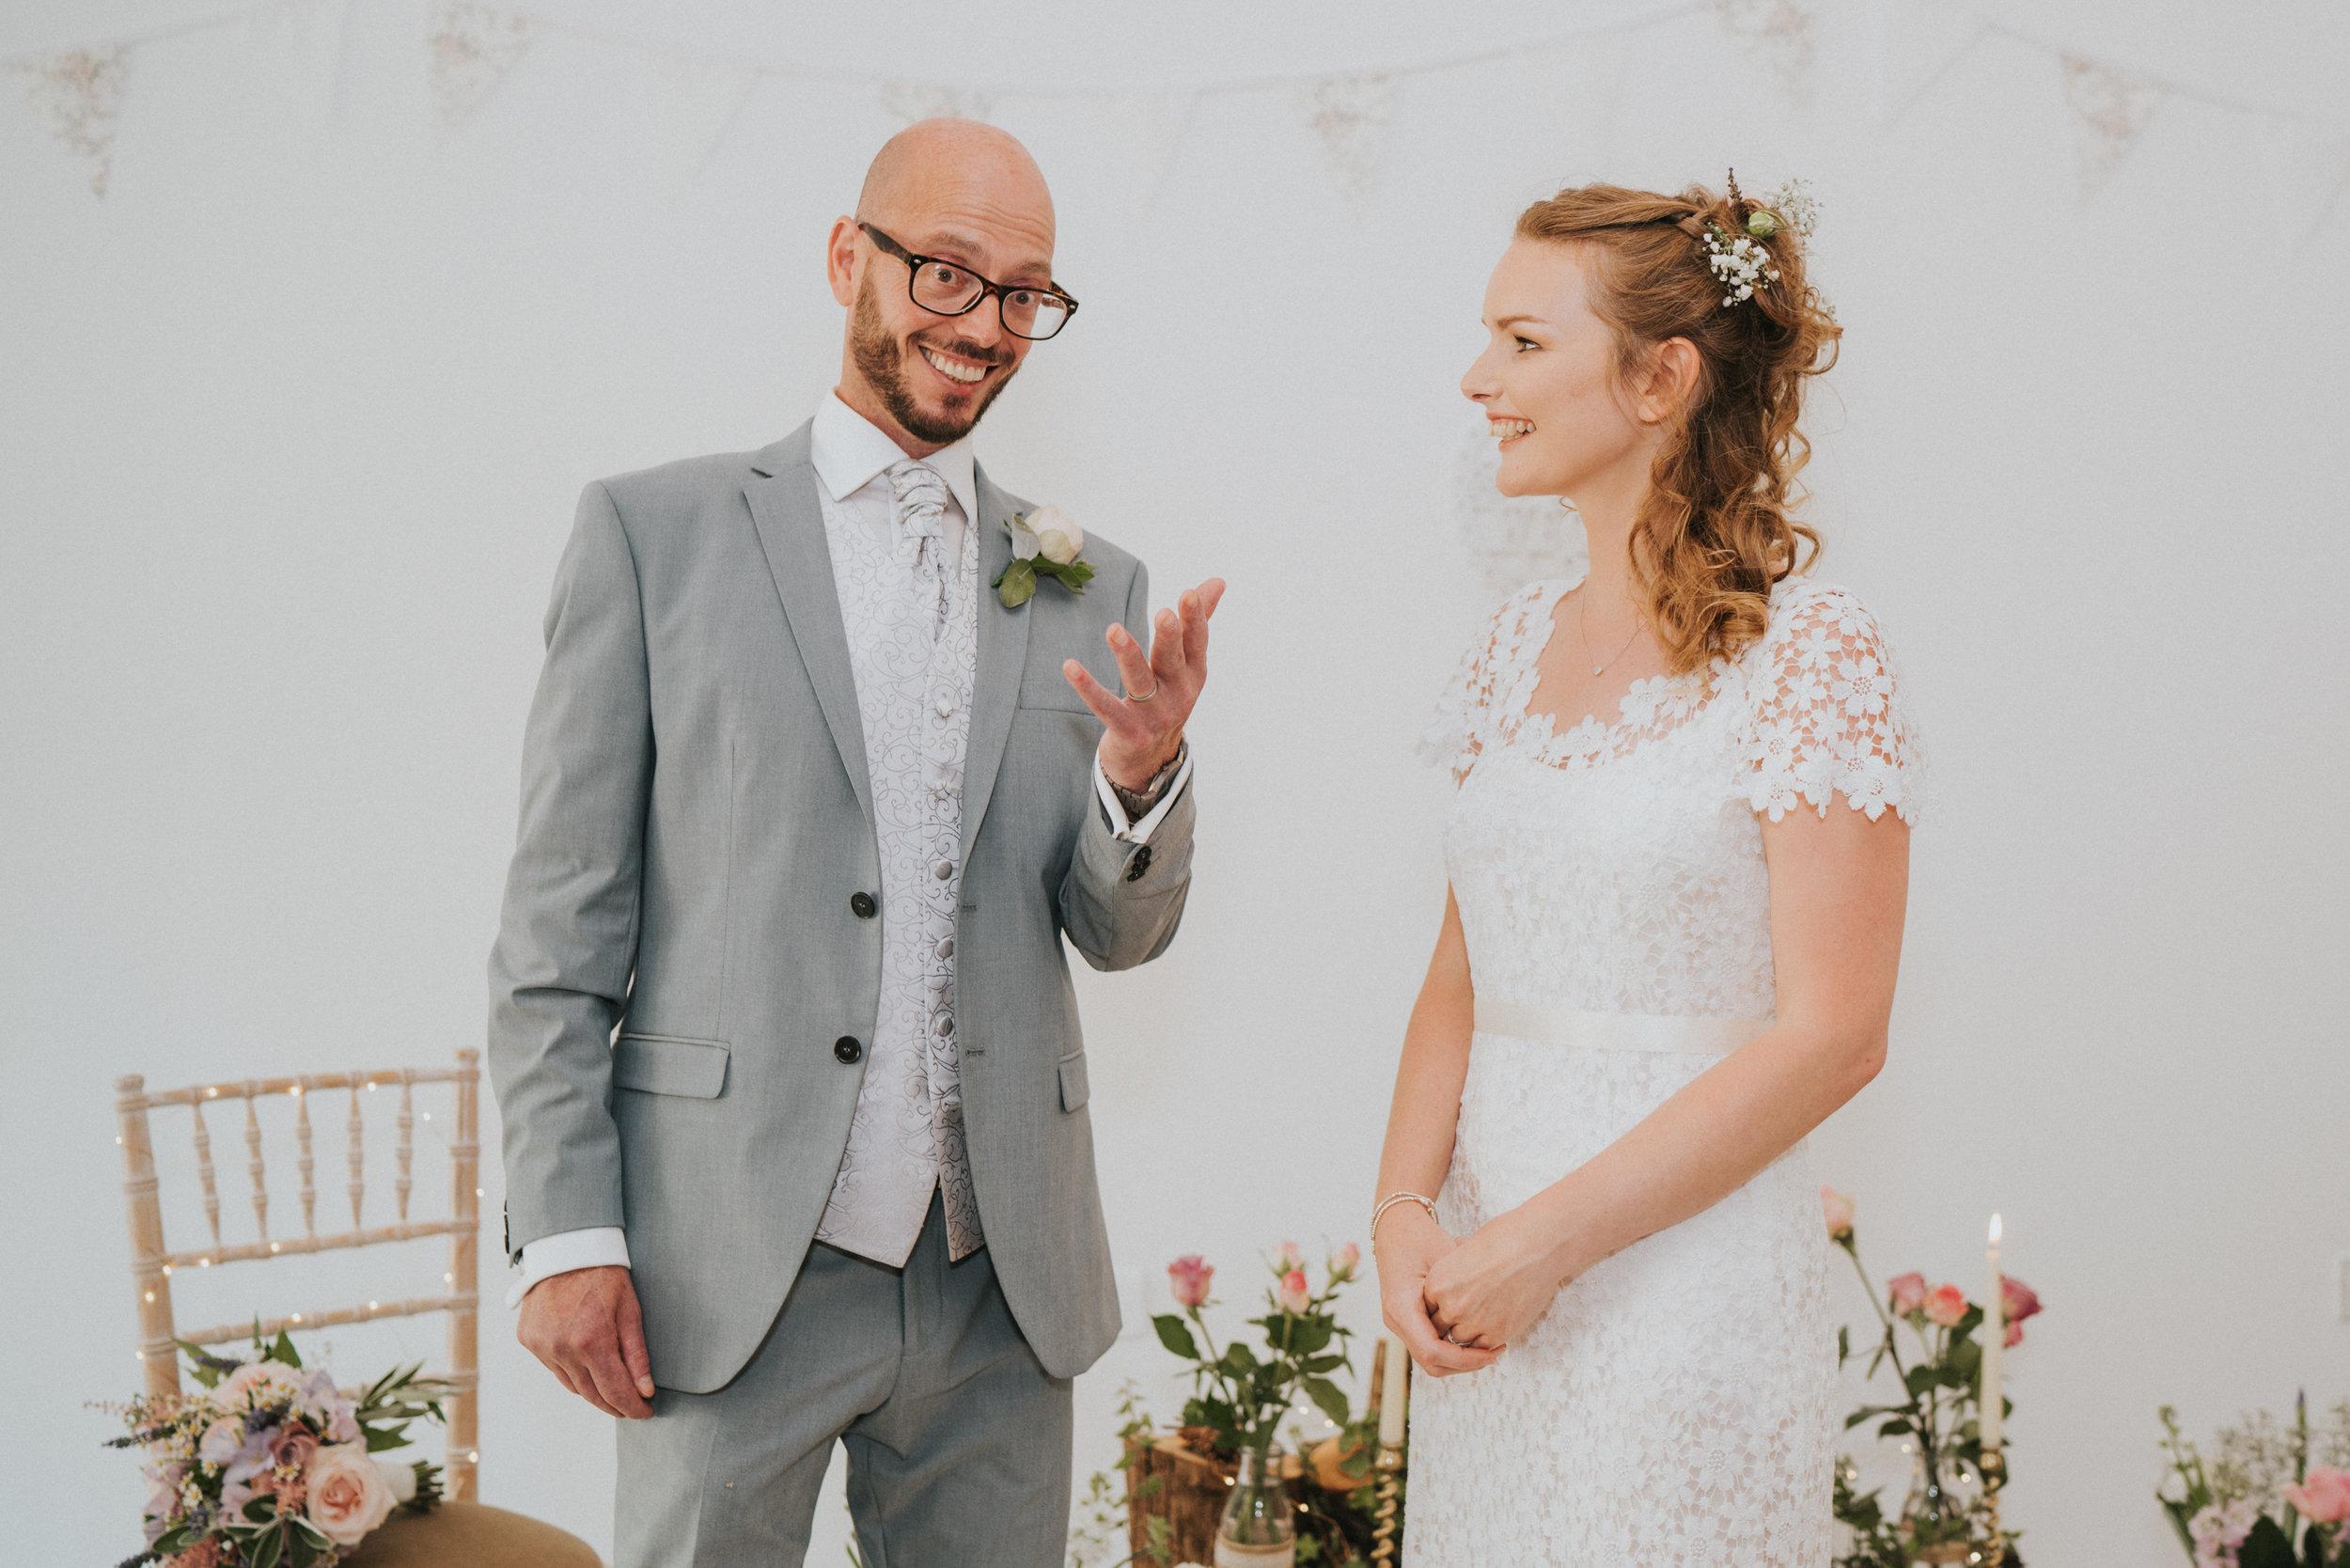 Grace-Elizabeth-Georgie-Amalaketu-Firstsite-Colchester-Essex-Boho-Buddhist-Wedding-Alternative-Wedding-Photography-Essex (63 of 100).jpg